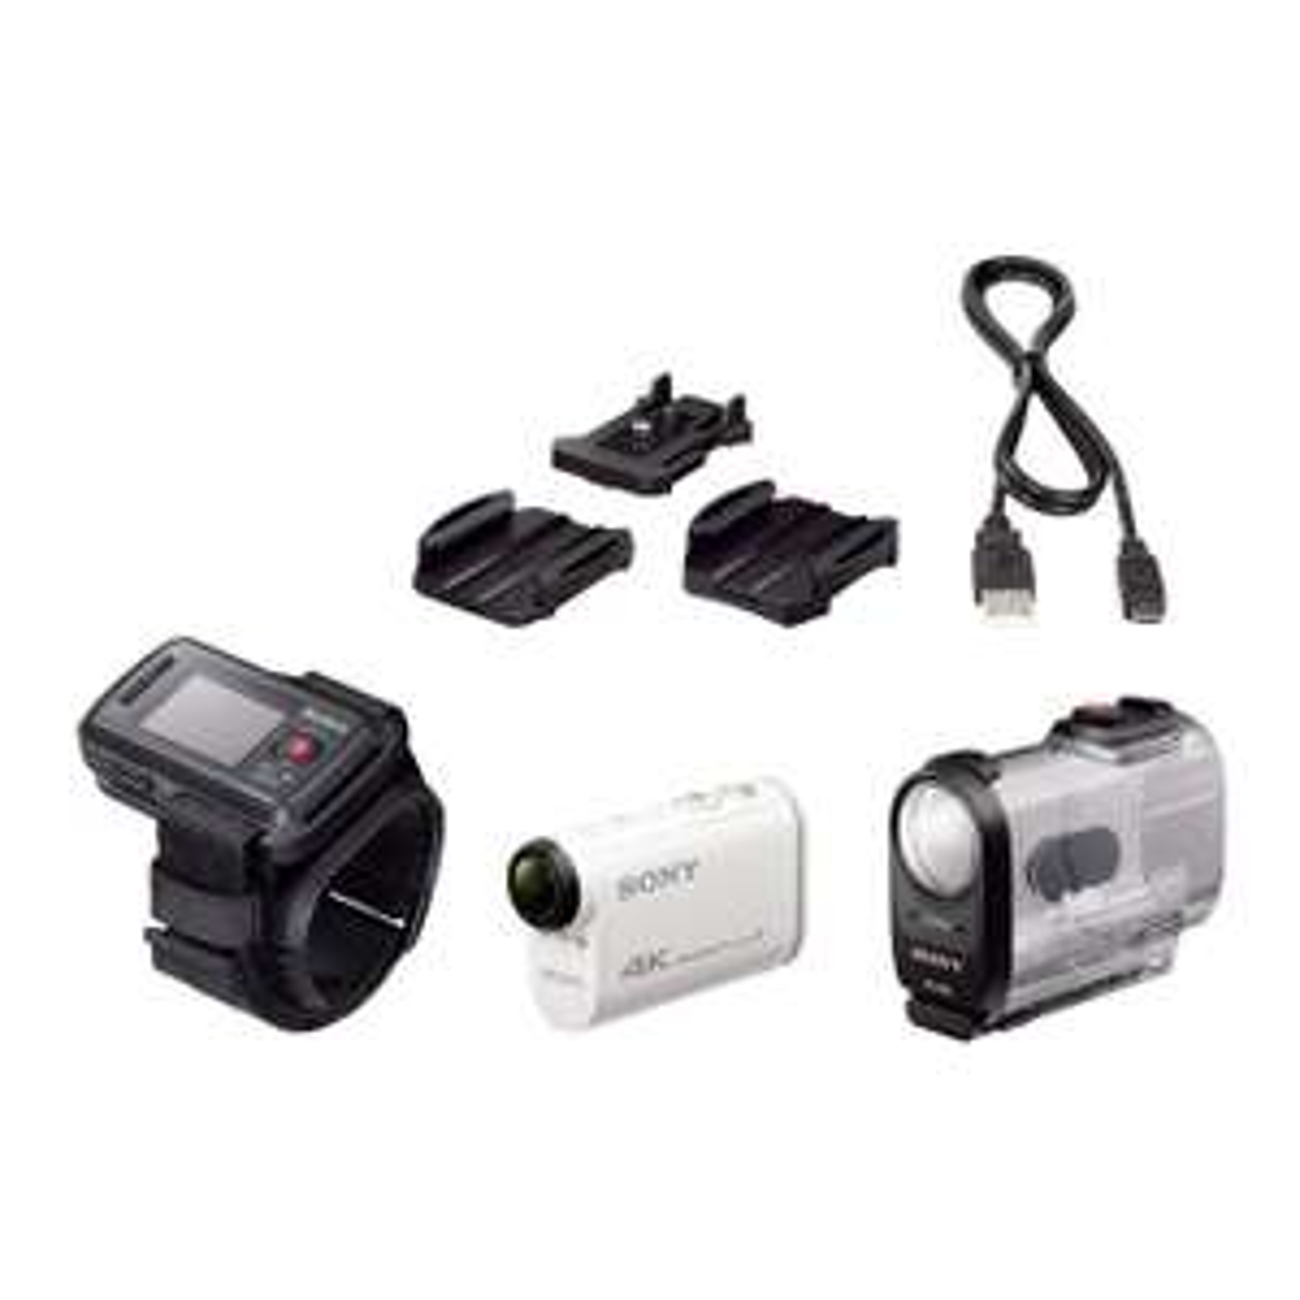 Caméra sportive Sony FDRX1000VR - 4K, Wifi, NFC + Montre de pilotage